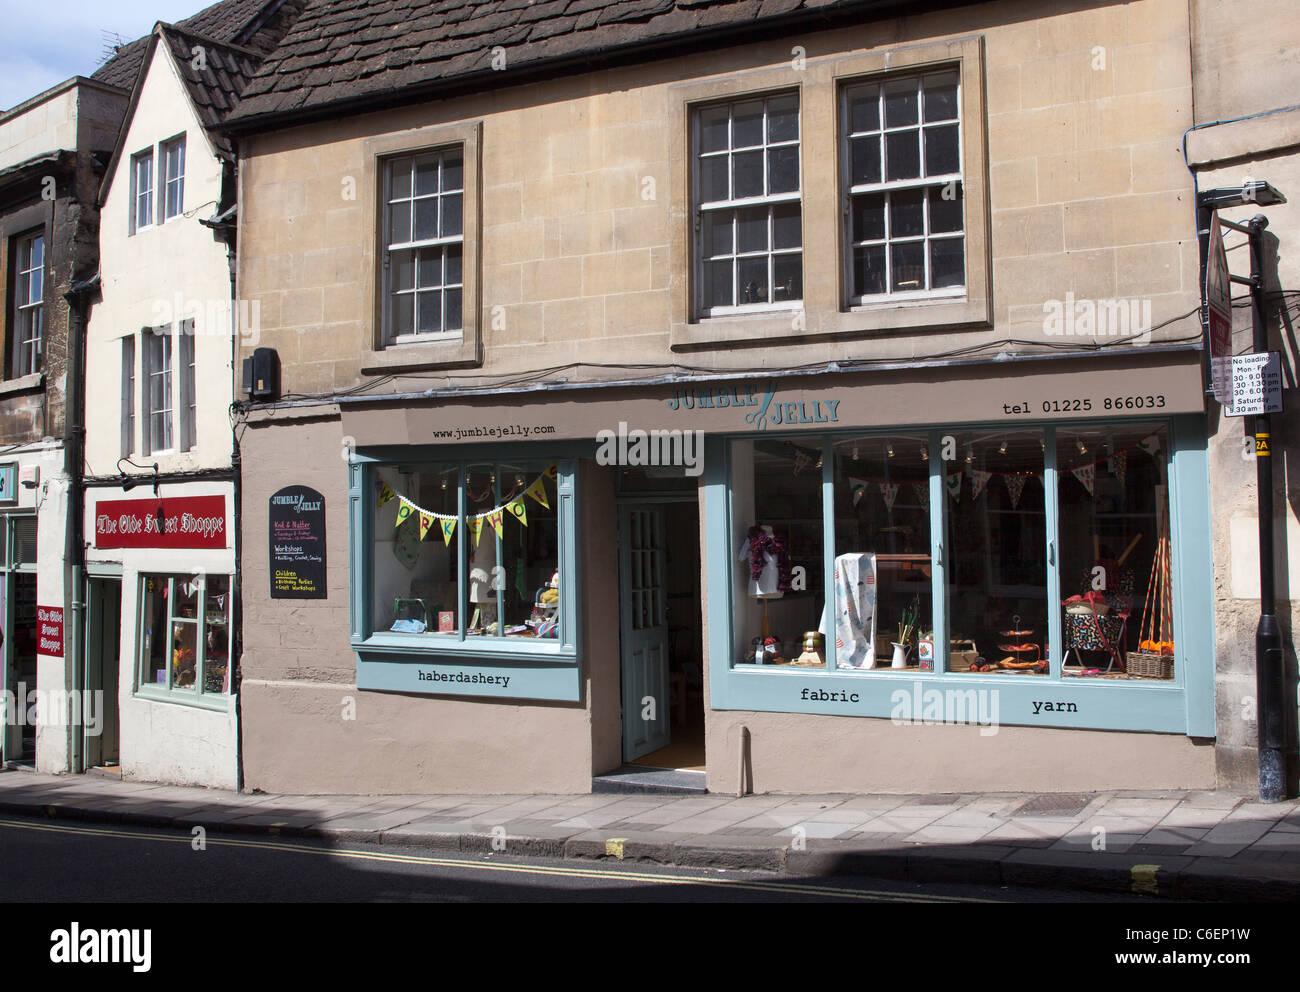 Jumble Jelly Shop Bradford on Avon - Stock Image